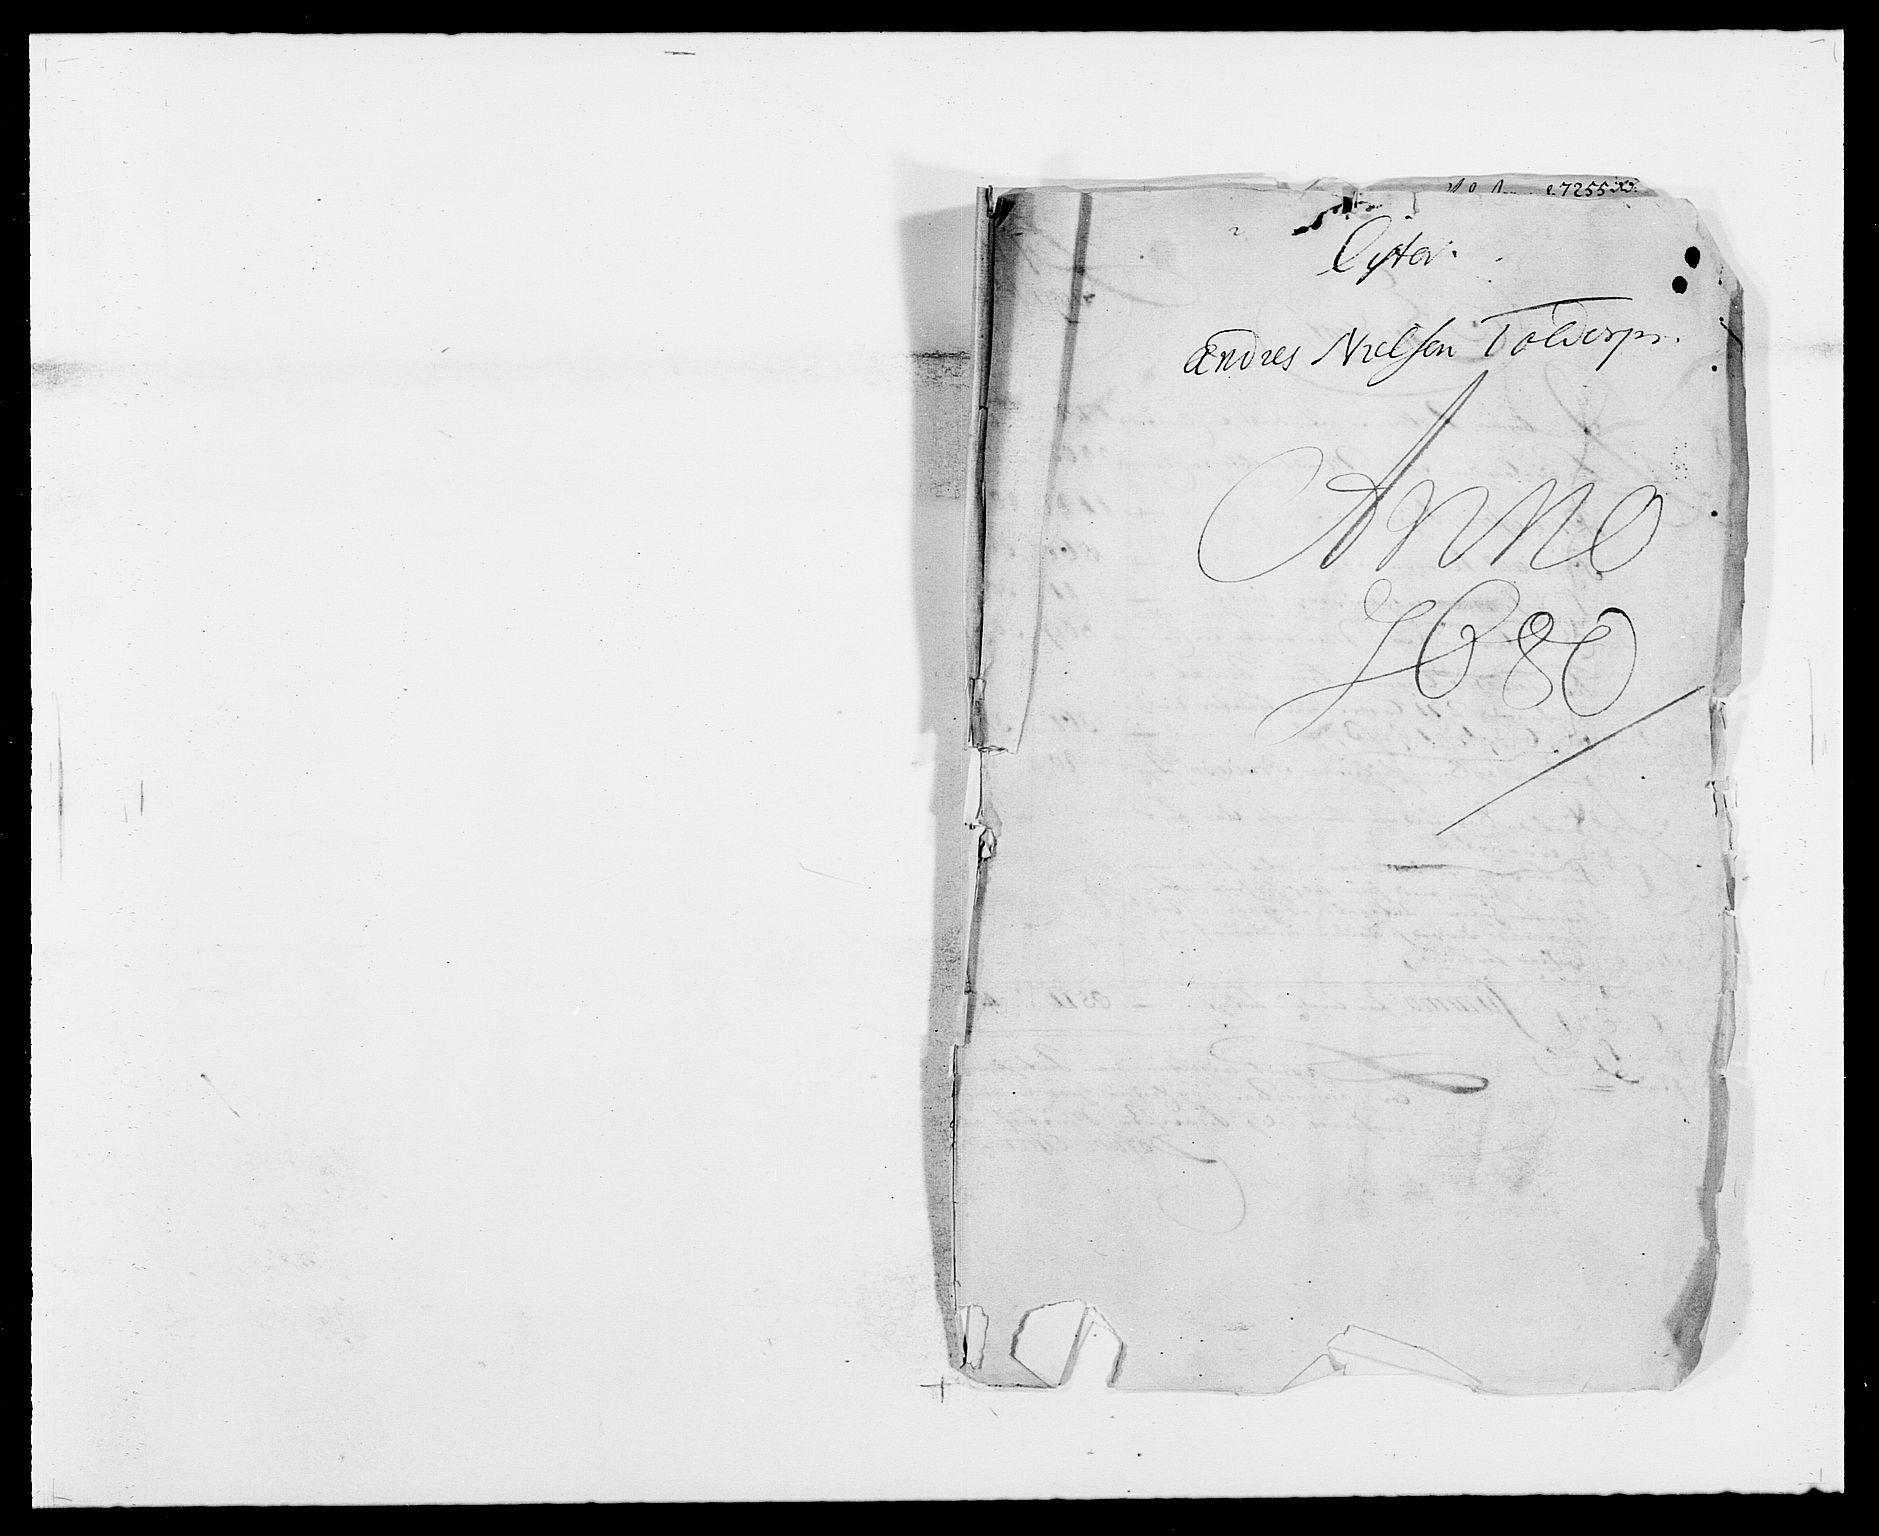 RA, Rentekammeret inntil 1814, Reviderte regnskaper, Fogderegnskap, R41/L2531: Fogderegnskap Lista, 1680-1682, s. 1